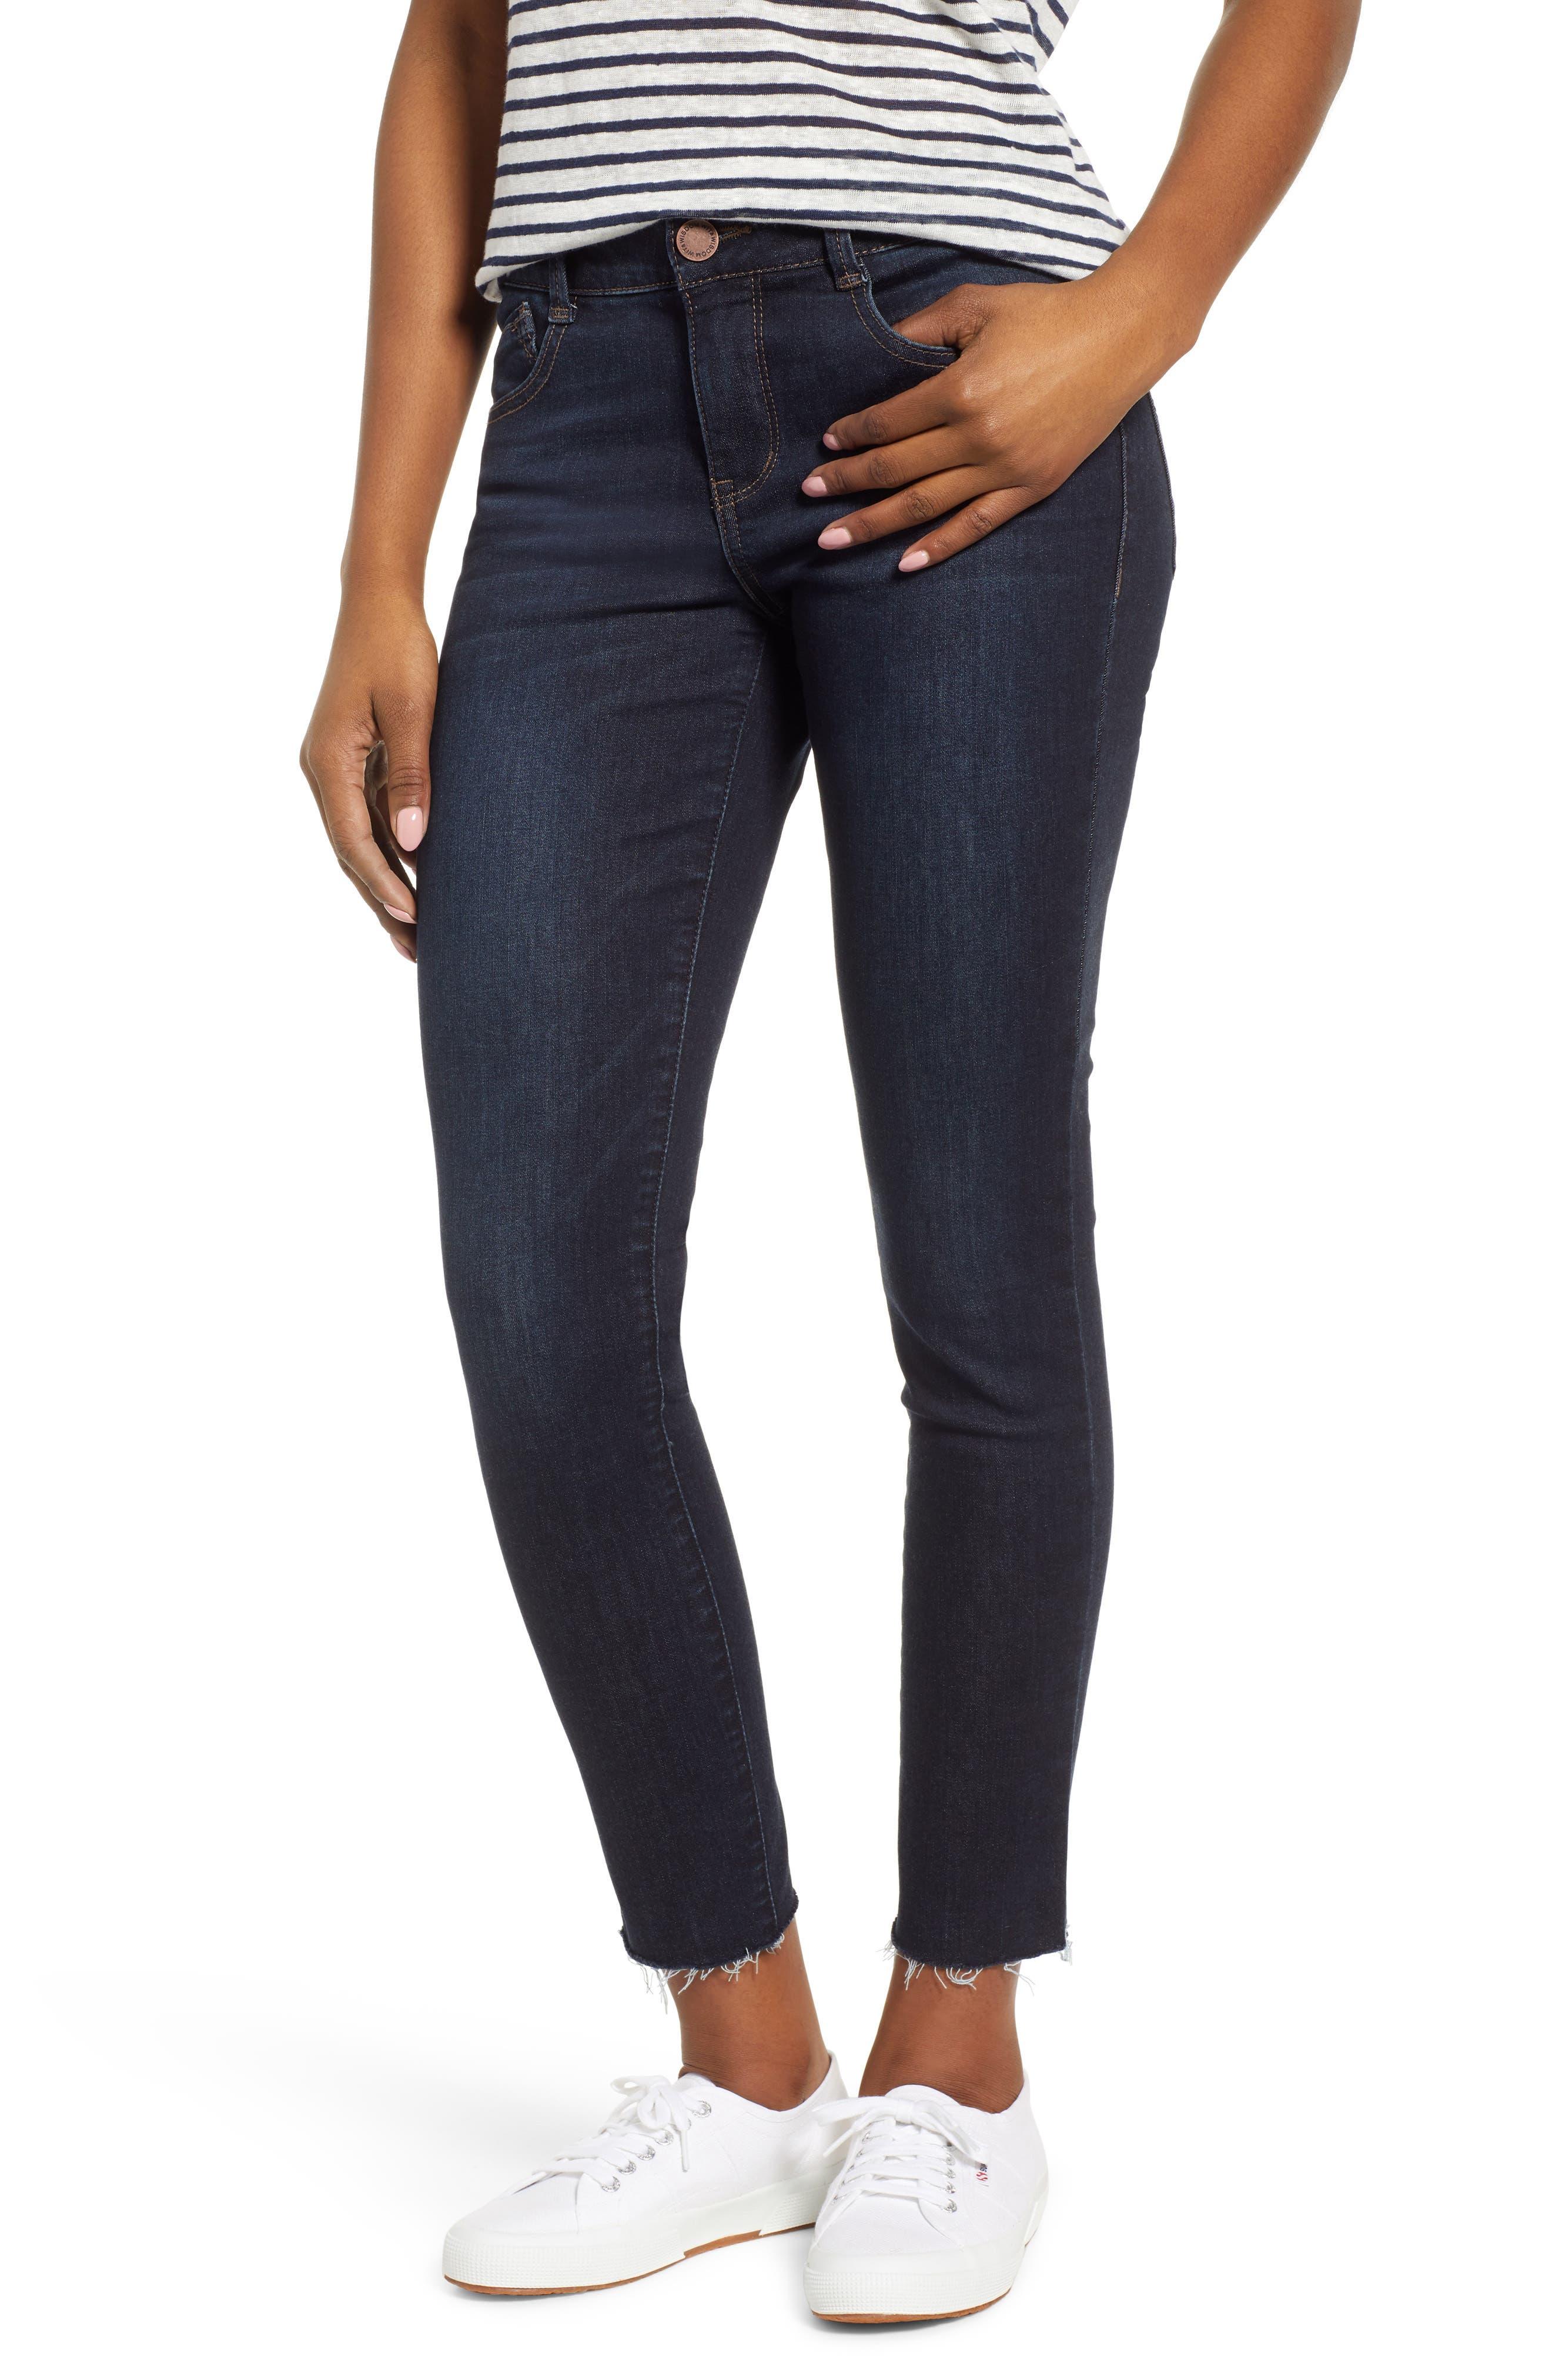 Petite Women's Wit & Wisdom Ab-Solution Raw Hem Skinny Jeans,  16P - Blue (Regular & Petite) (Nordstrom Exclusive)